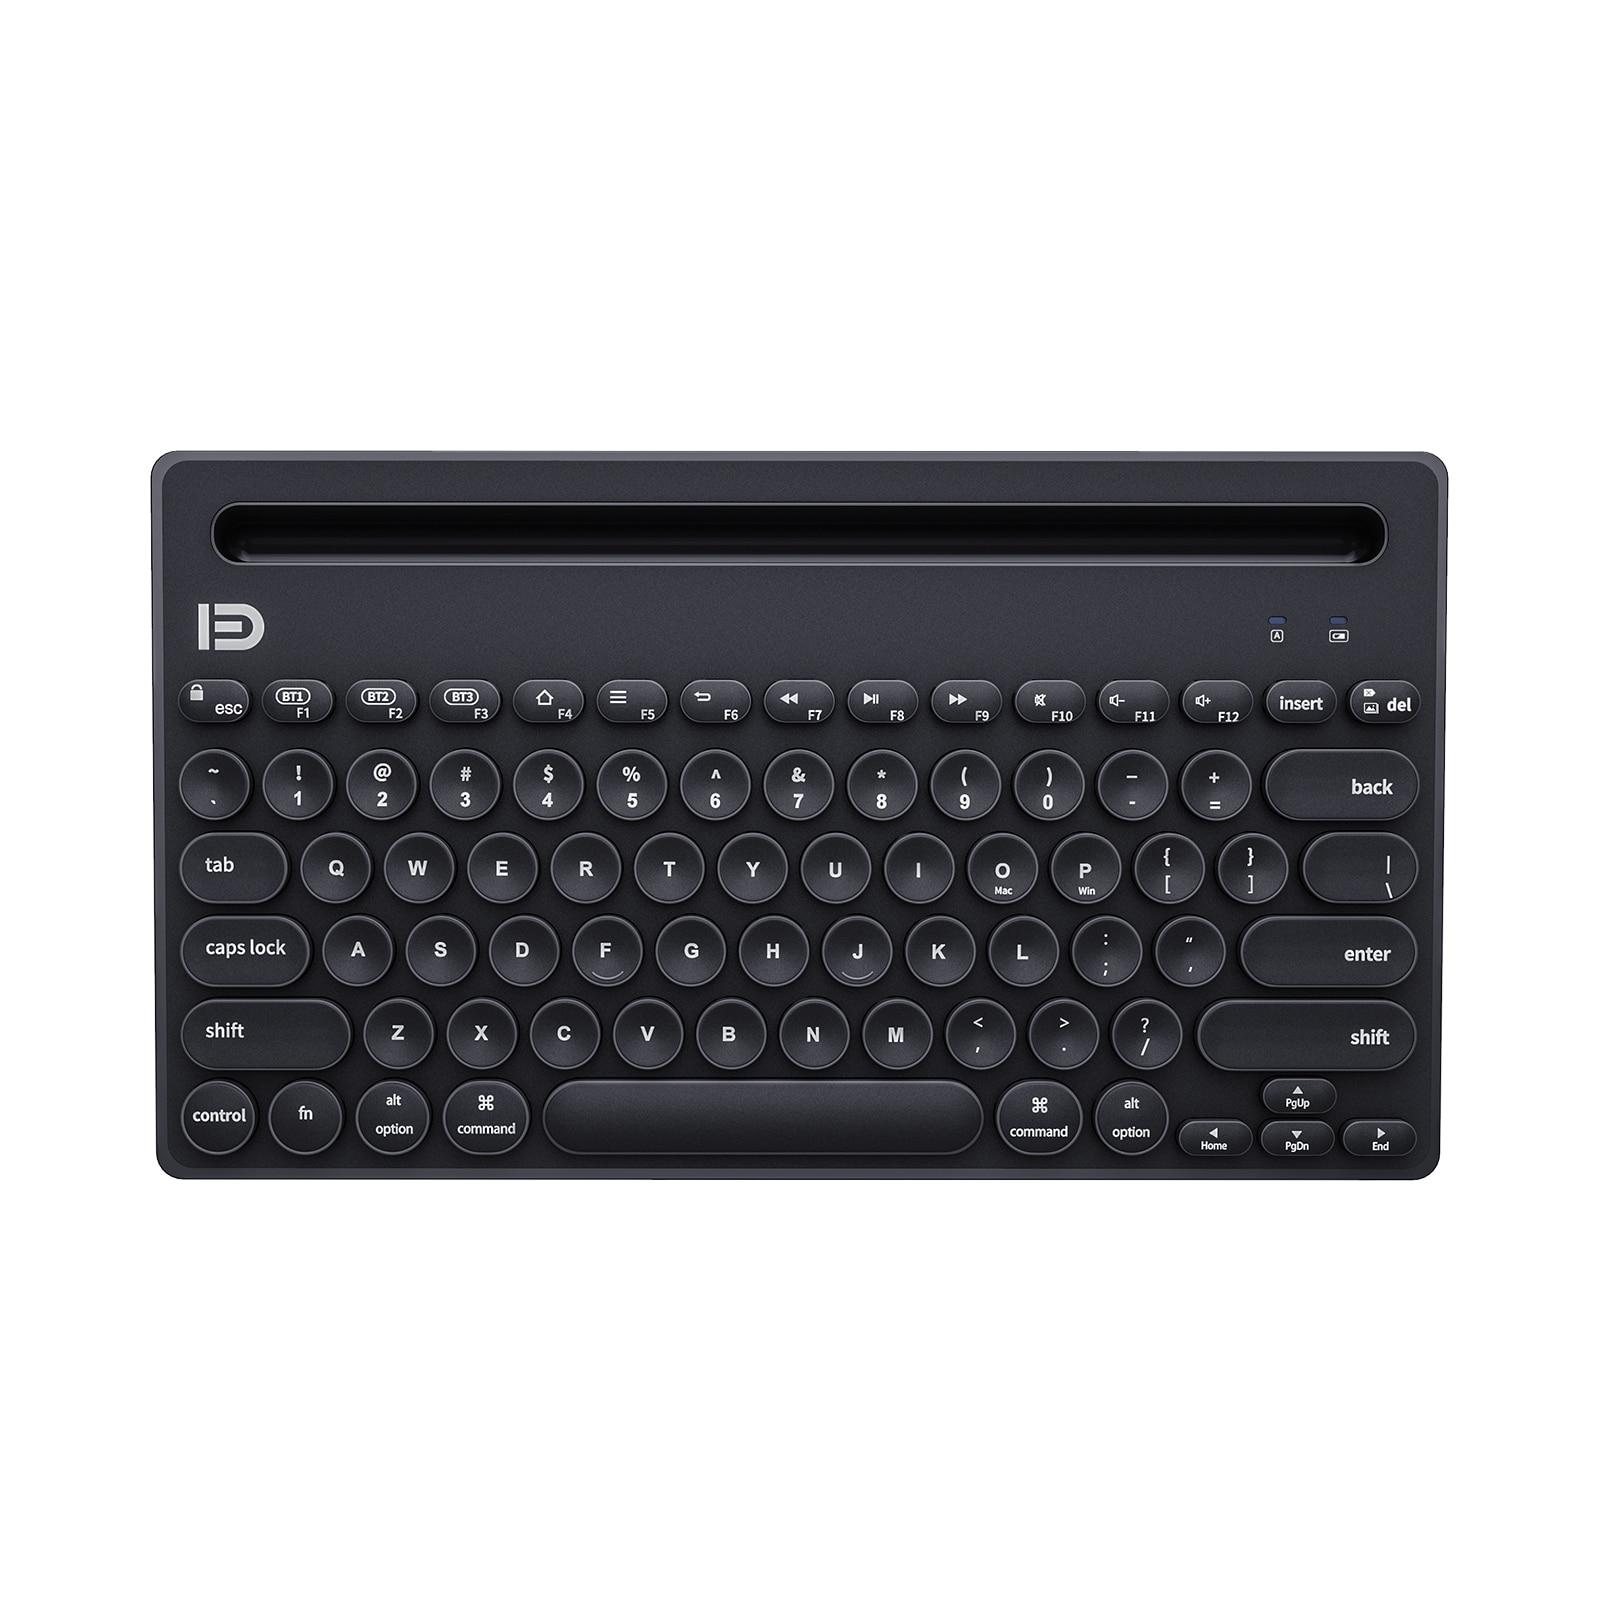 Ik3381m متعدد الأجهزة المحمولة بلوتوث لوحة المفاتيح ، FD آلة كاتبة مفاتيح مستديرة ، متوافق مع الكمبيوتر اللوحي المحمول هواتف محمولة